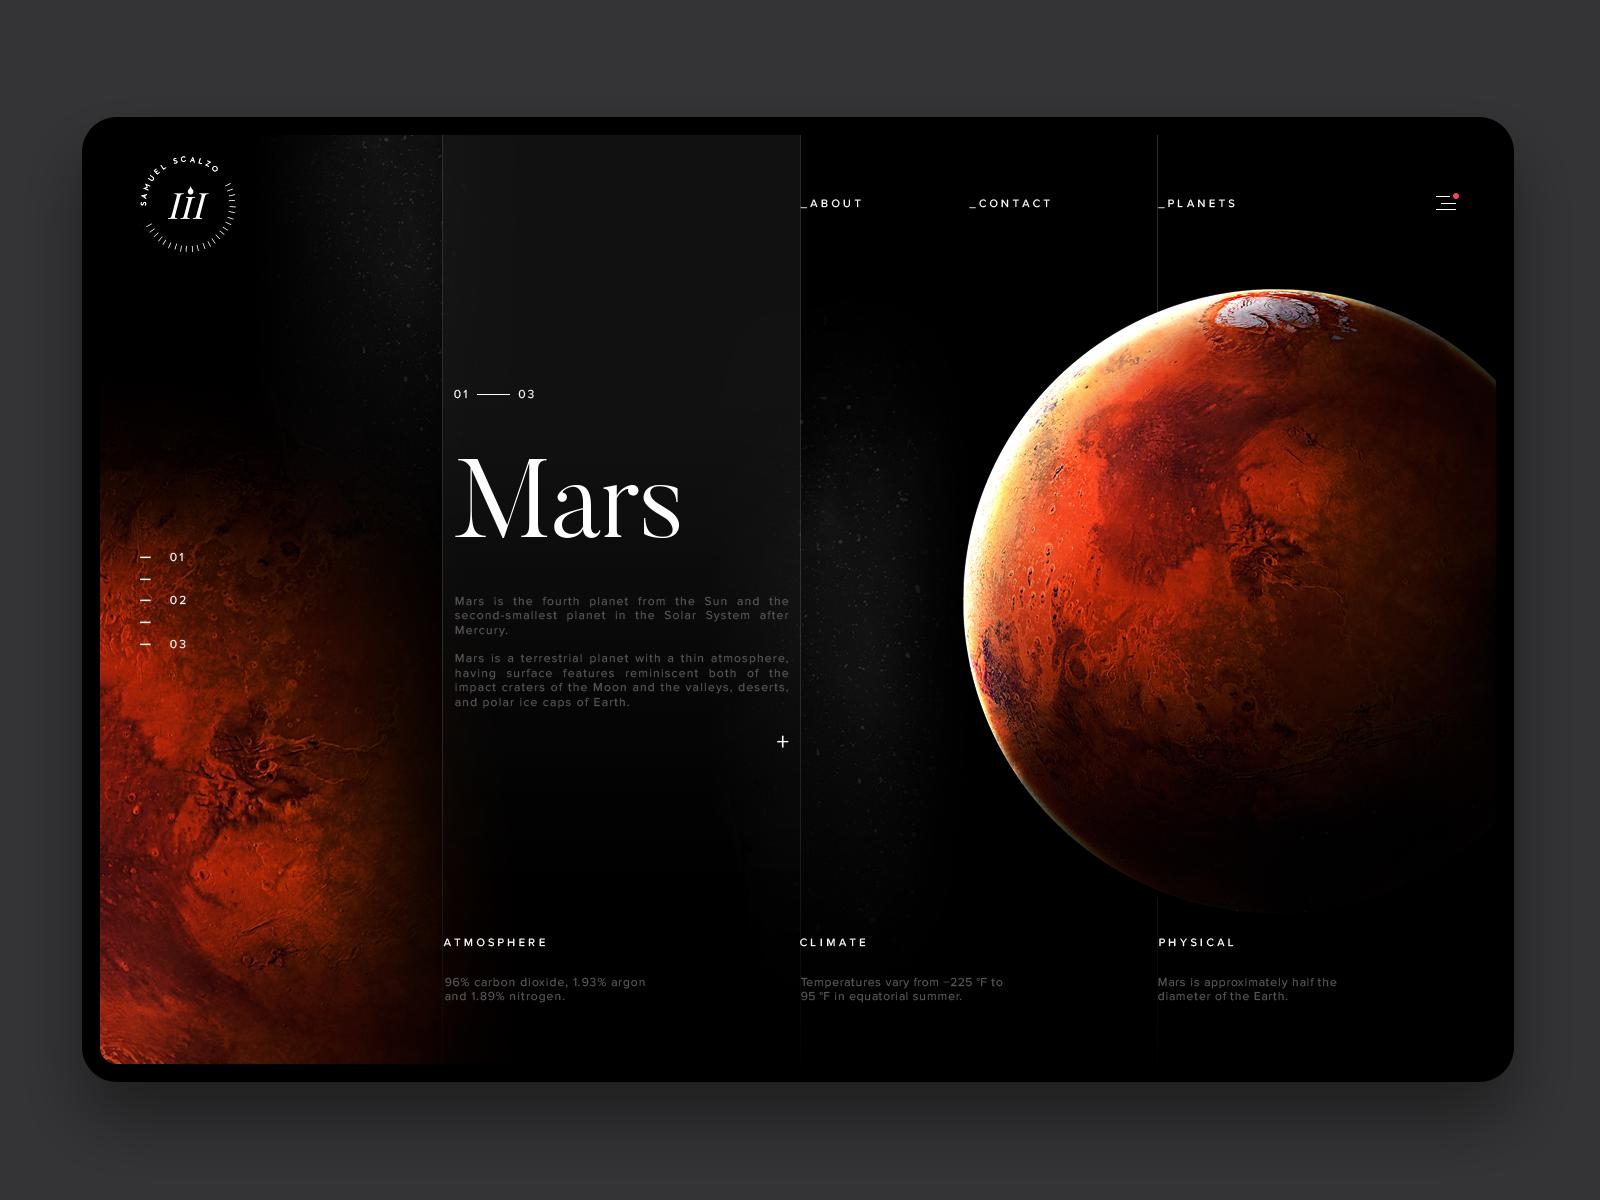 Space exploration mars hd